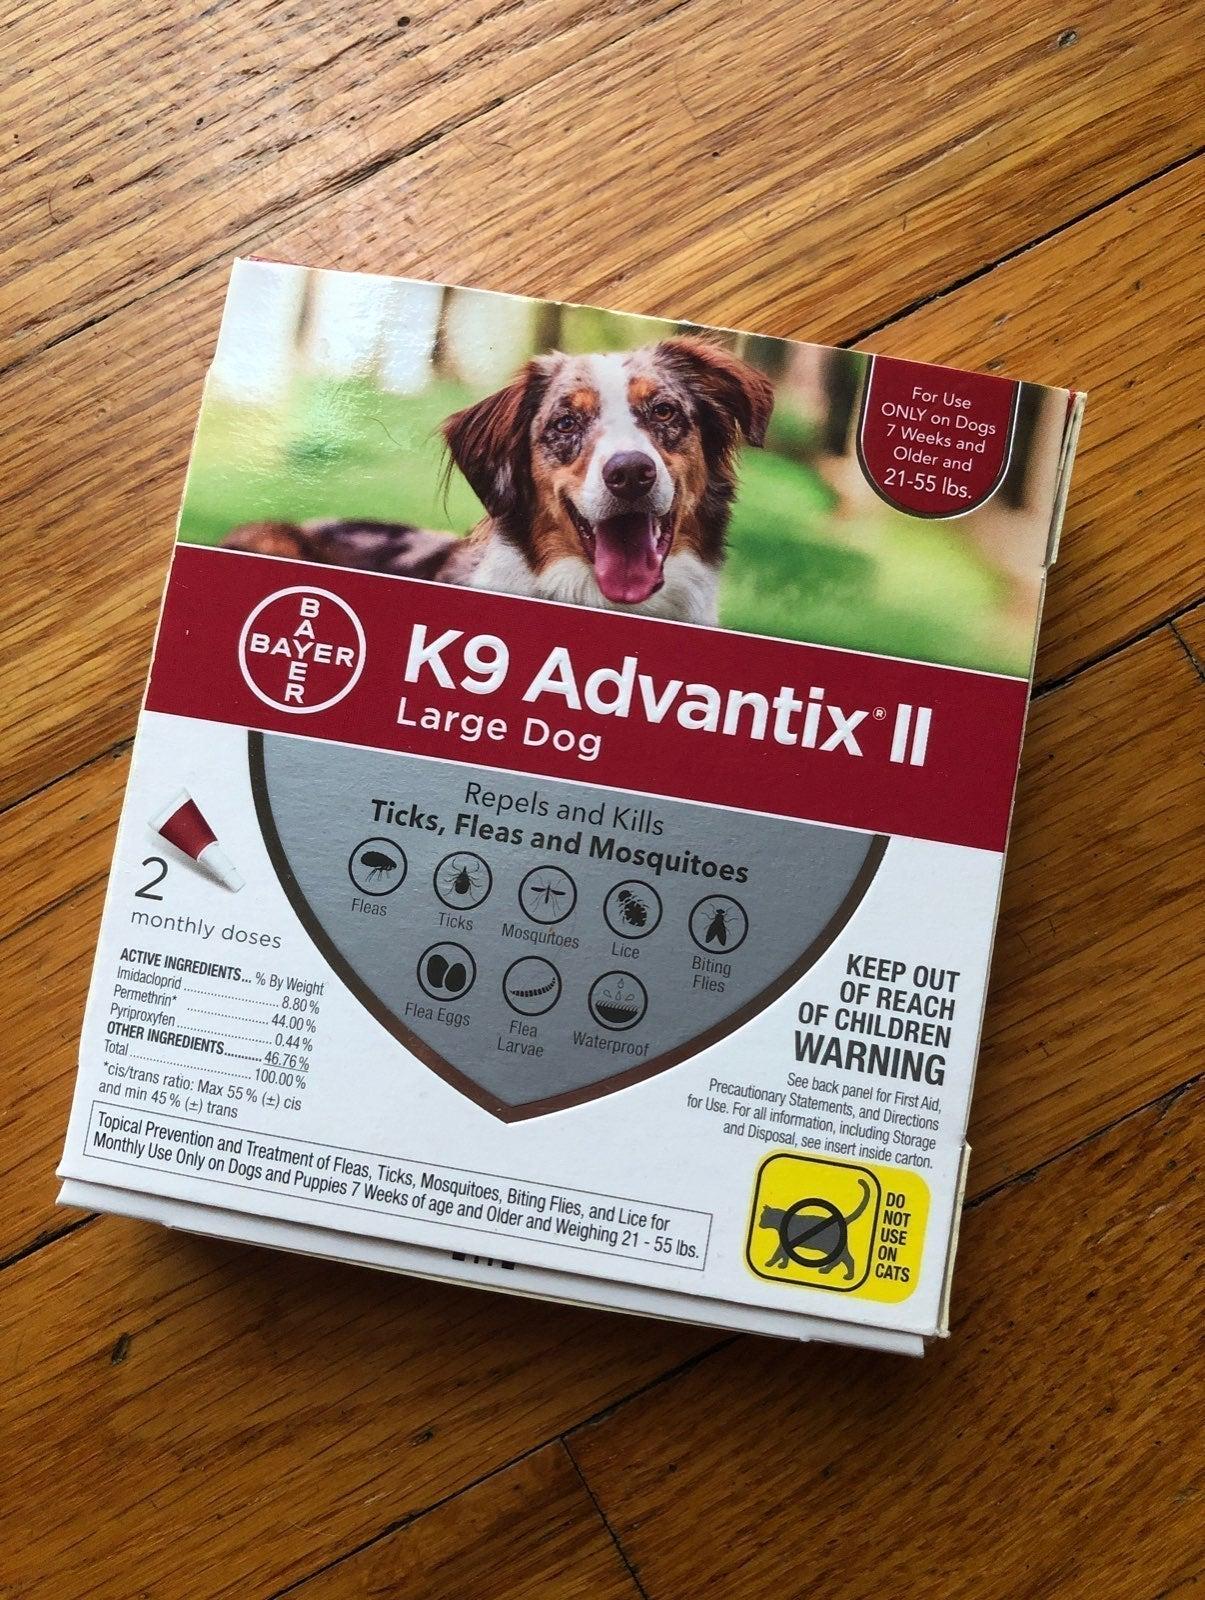 Bayer K9-Advantix ll (Large Dog)